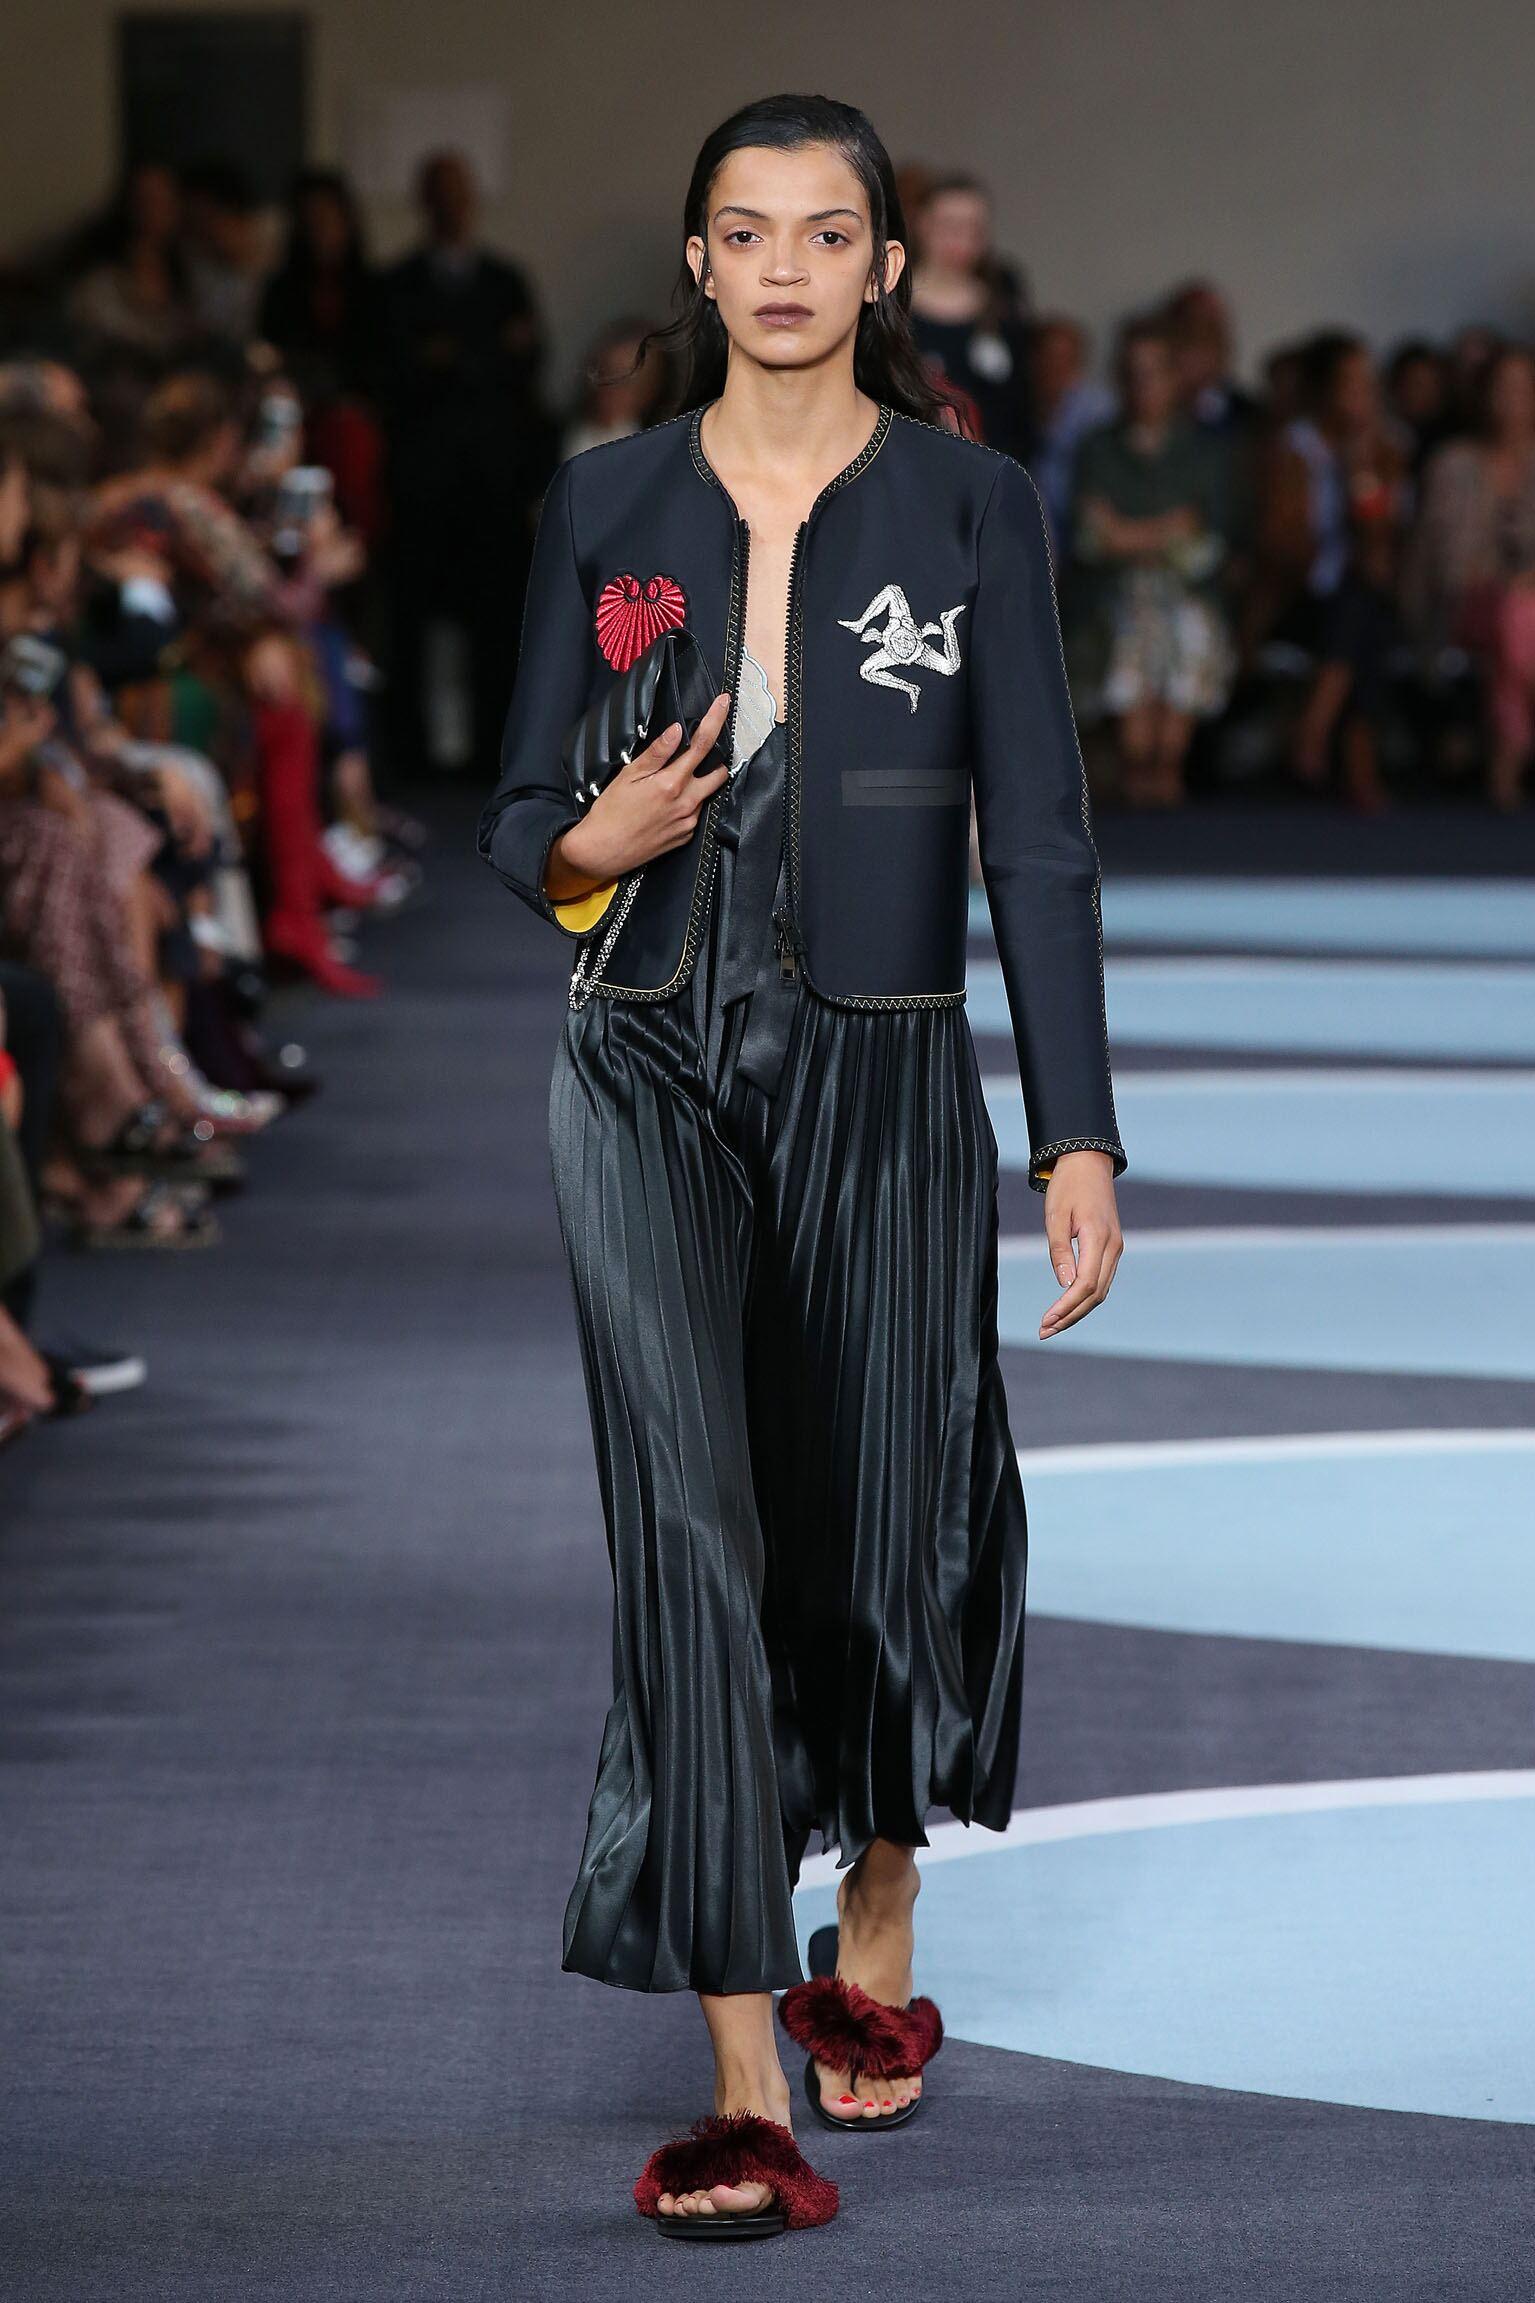 2018 Catwalk Marco De Vincenzo Woman Fashion Show Summer